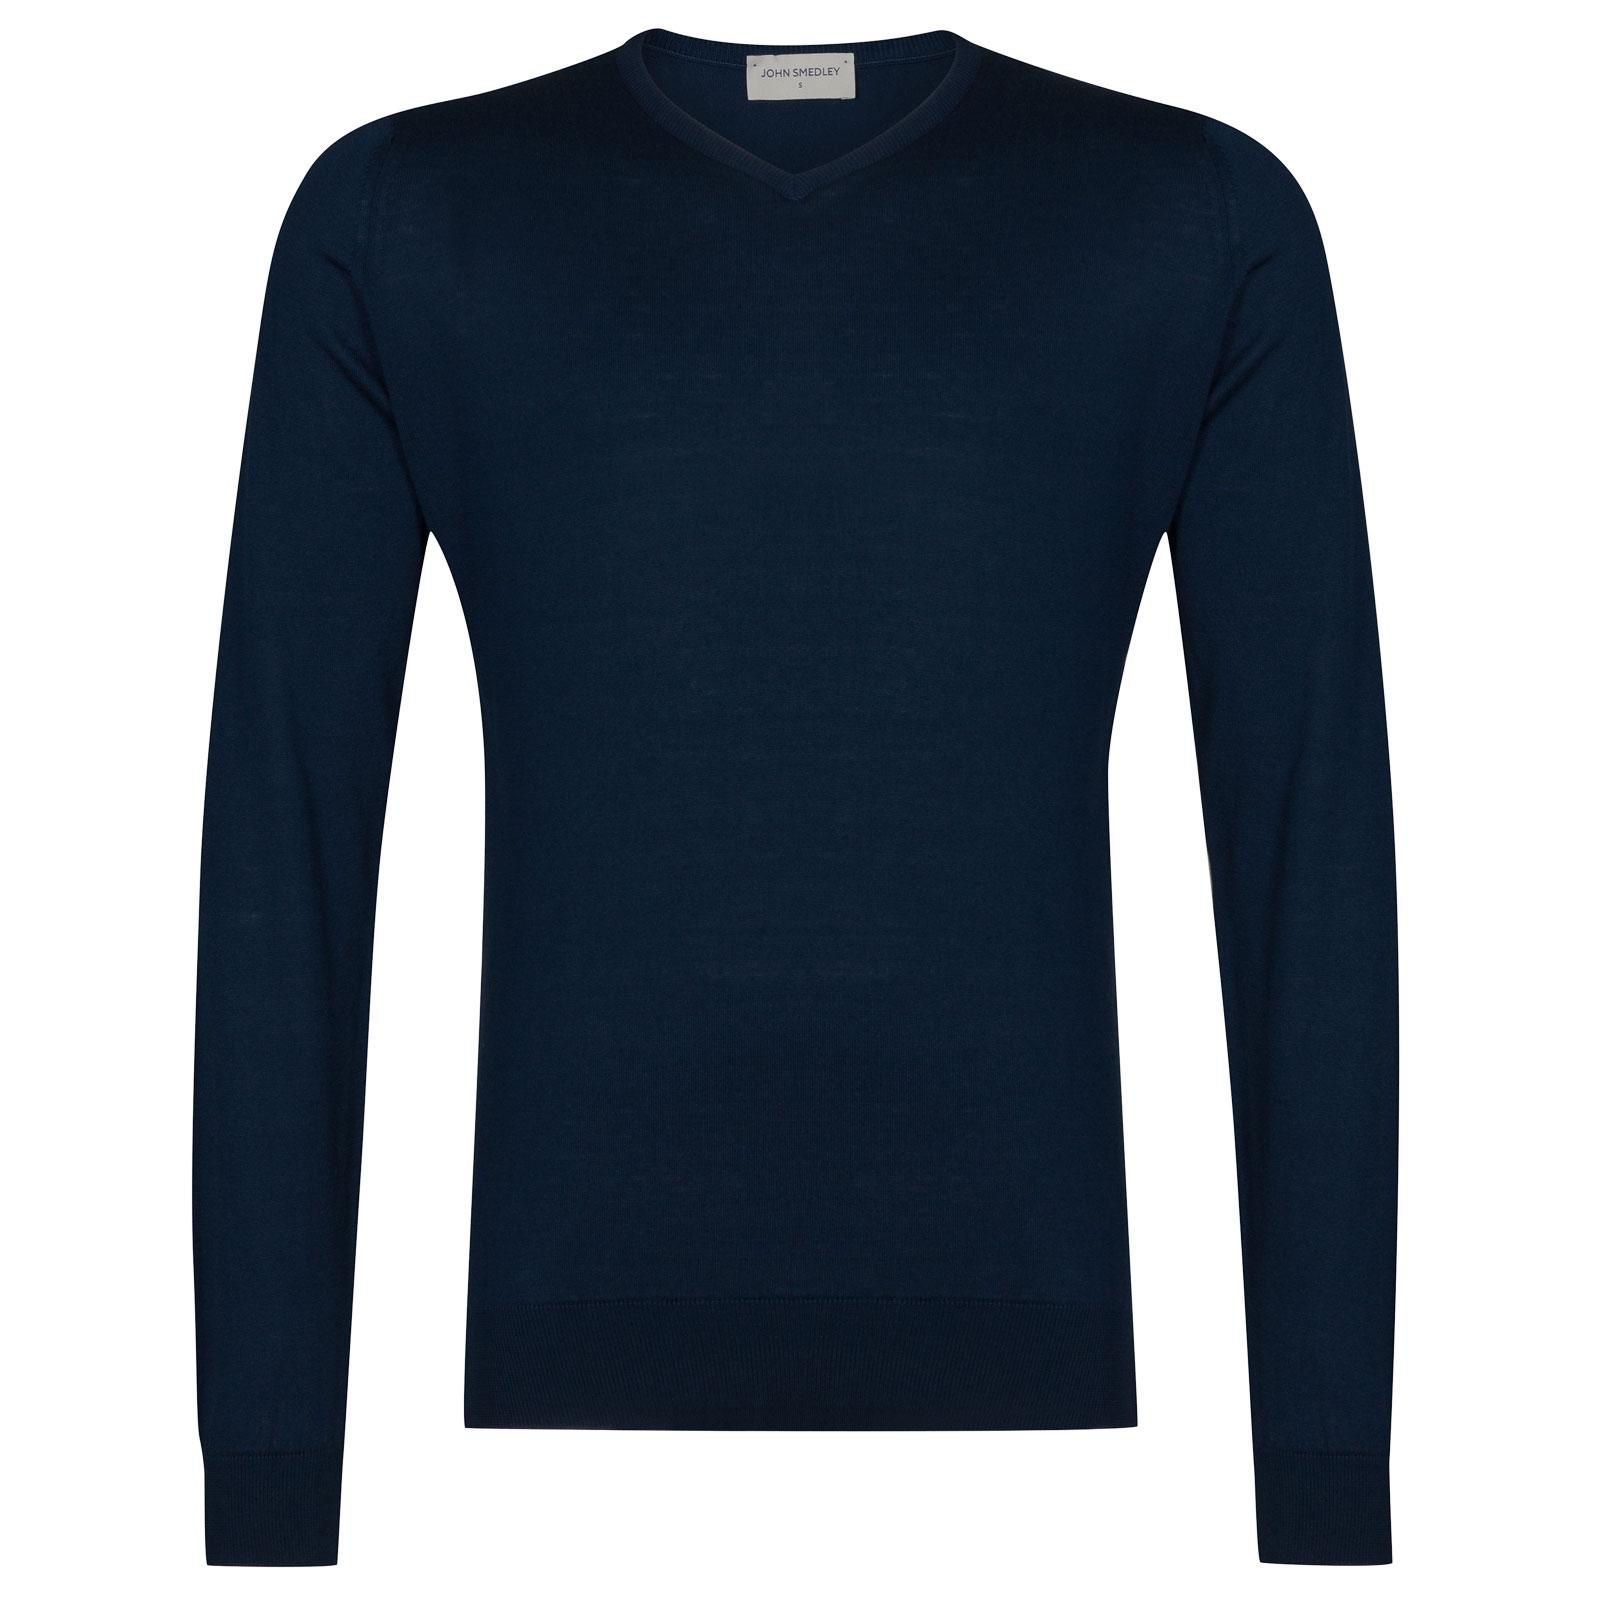 John Smedley Aydon Sea Island Cotton Pullover in Indigo-M